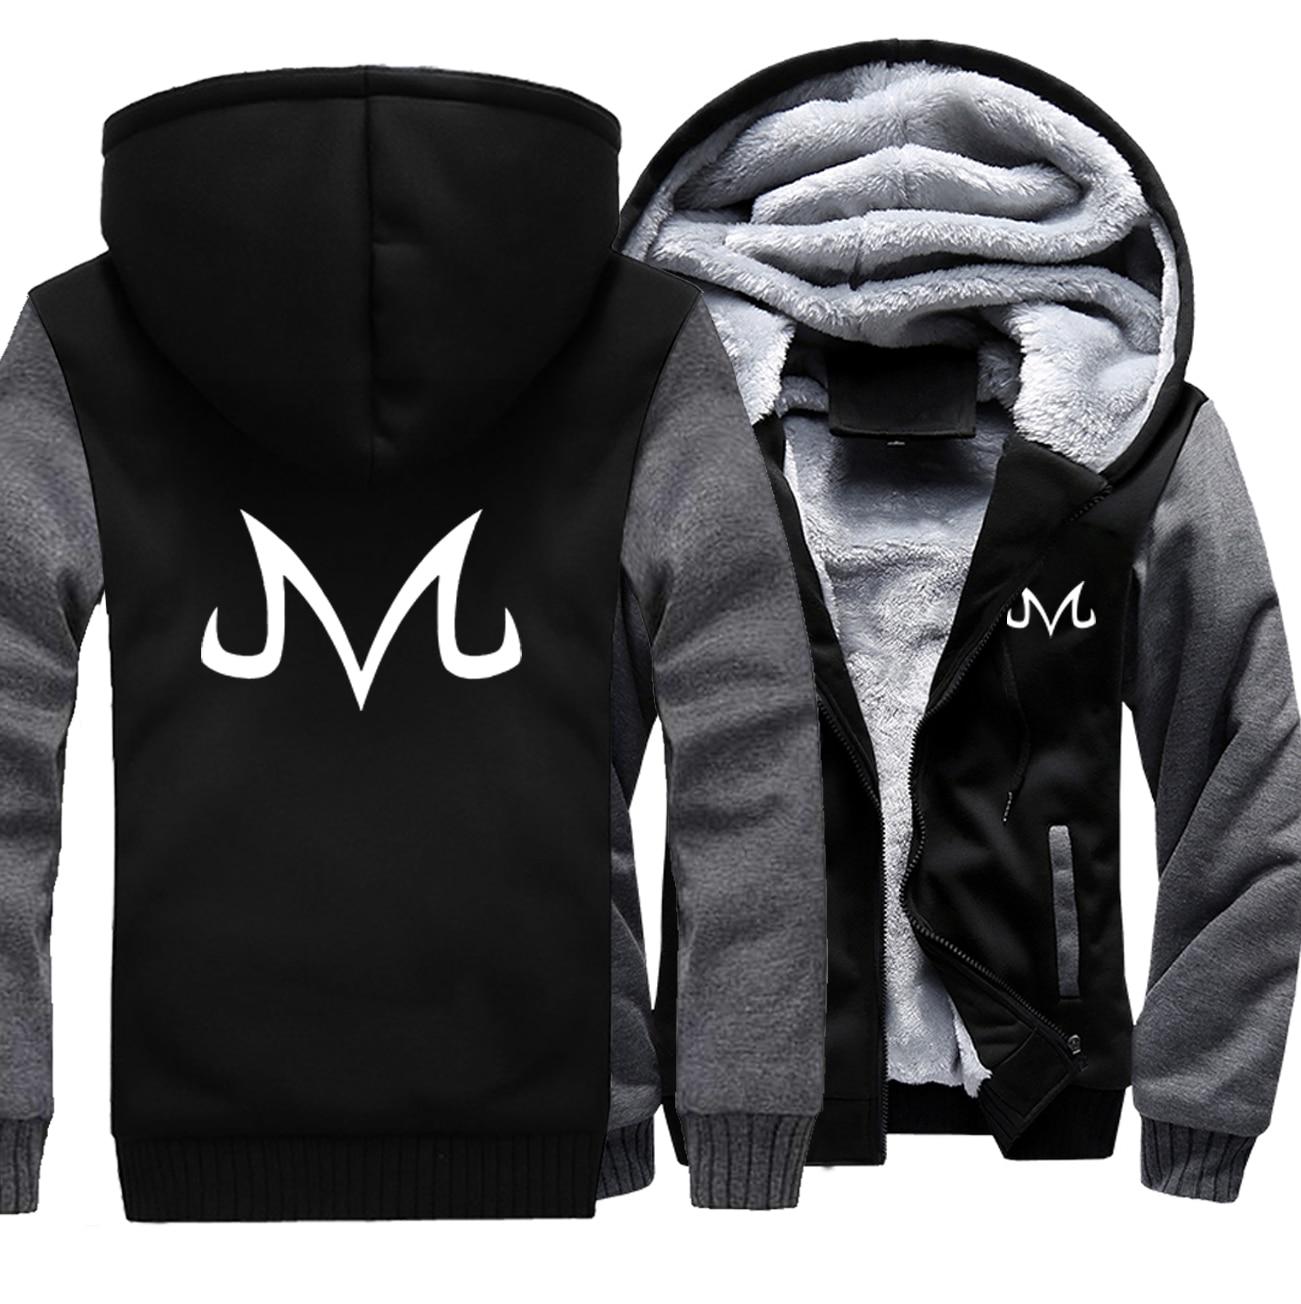 2019 primavera inverno grosso hoodies masculino dragon ball z anime japonês casual masculino streetwear moletom masculino jaquetas